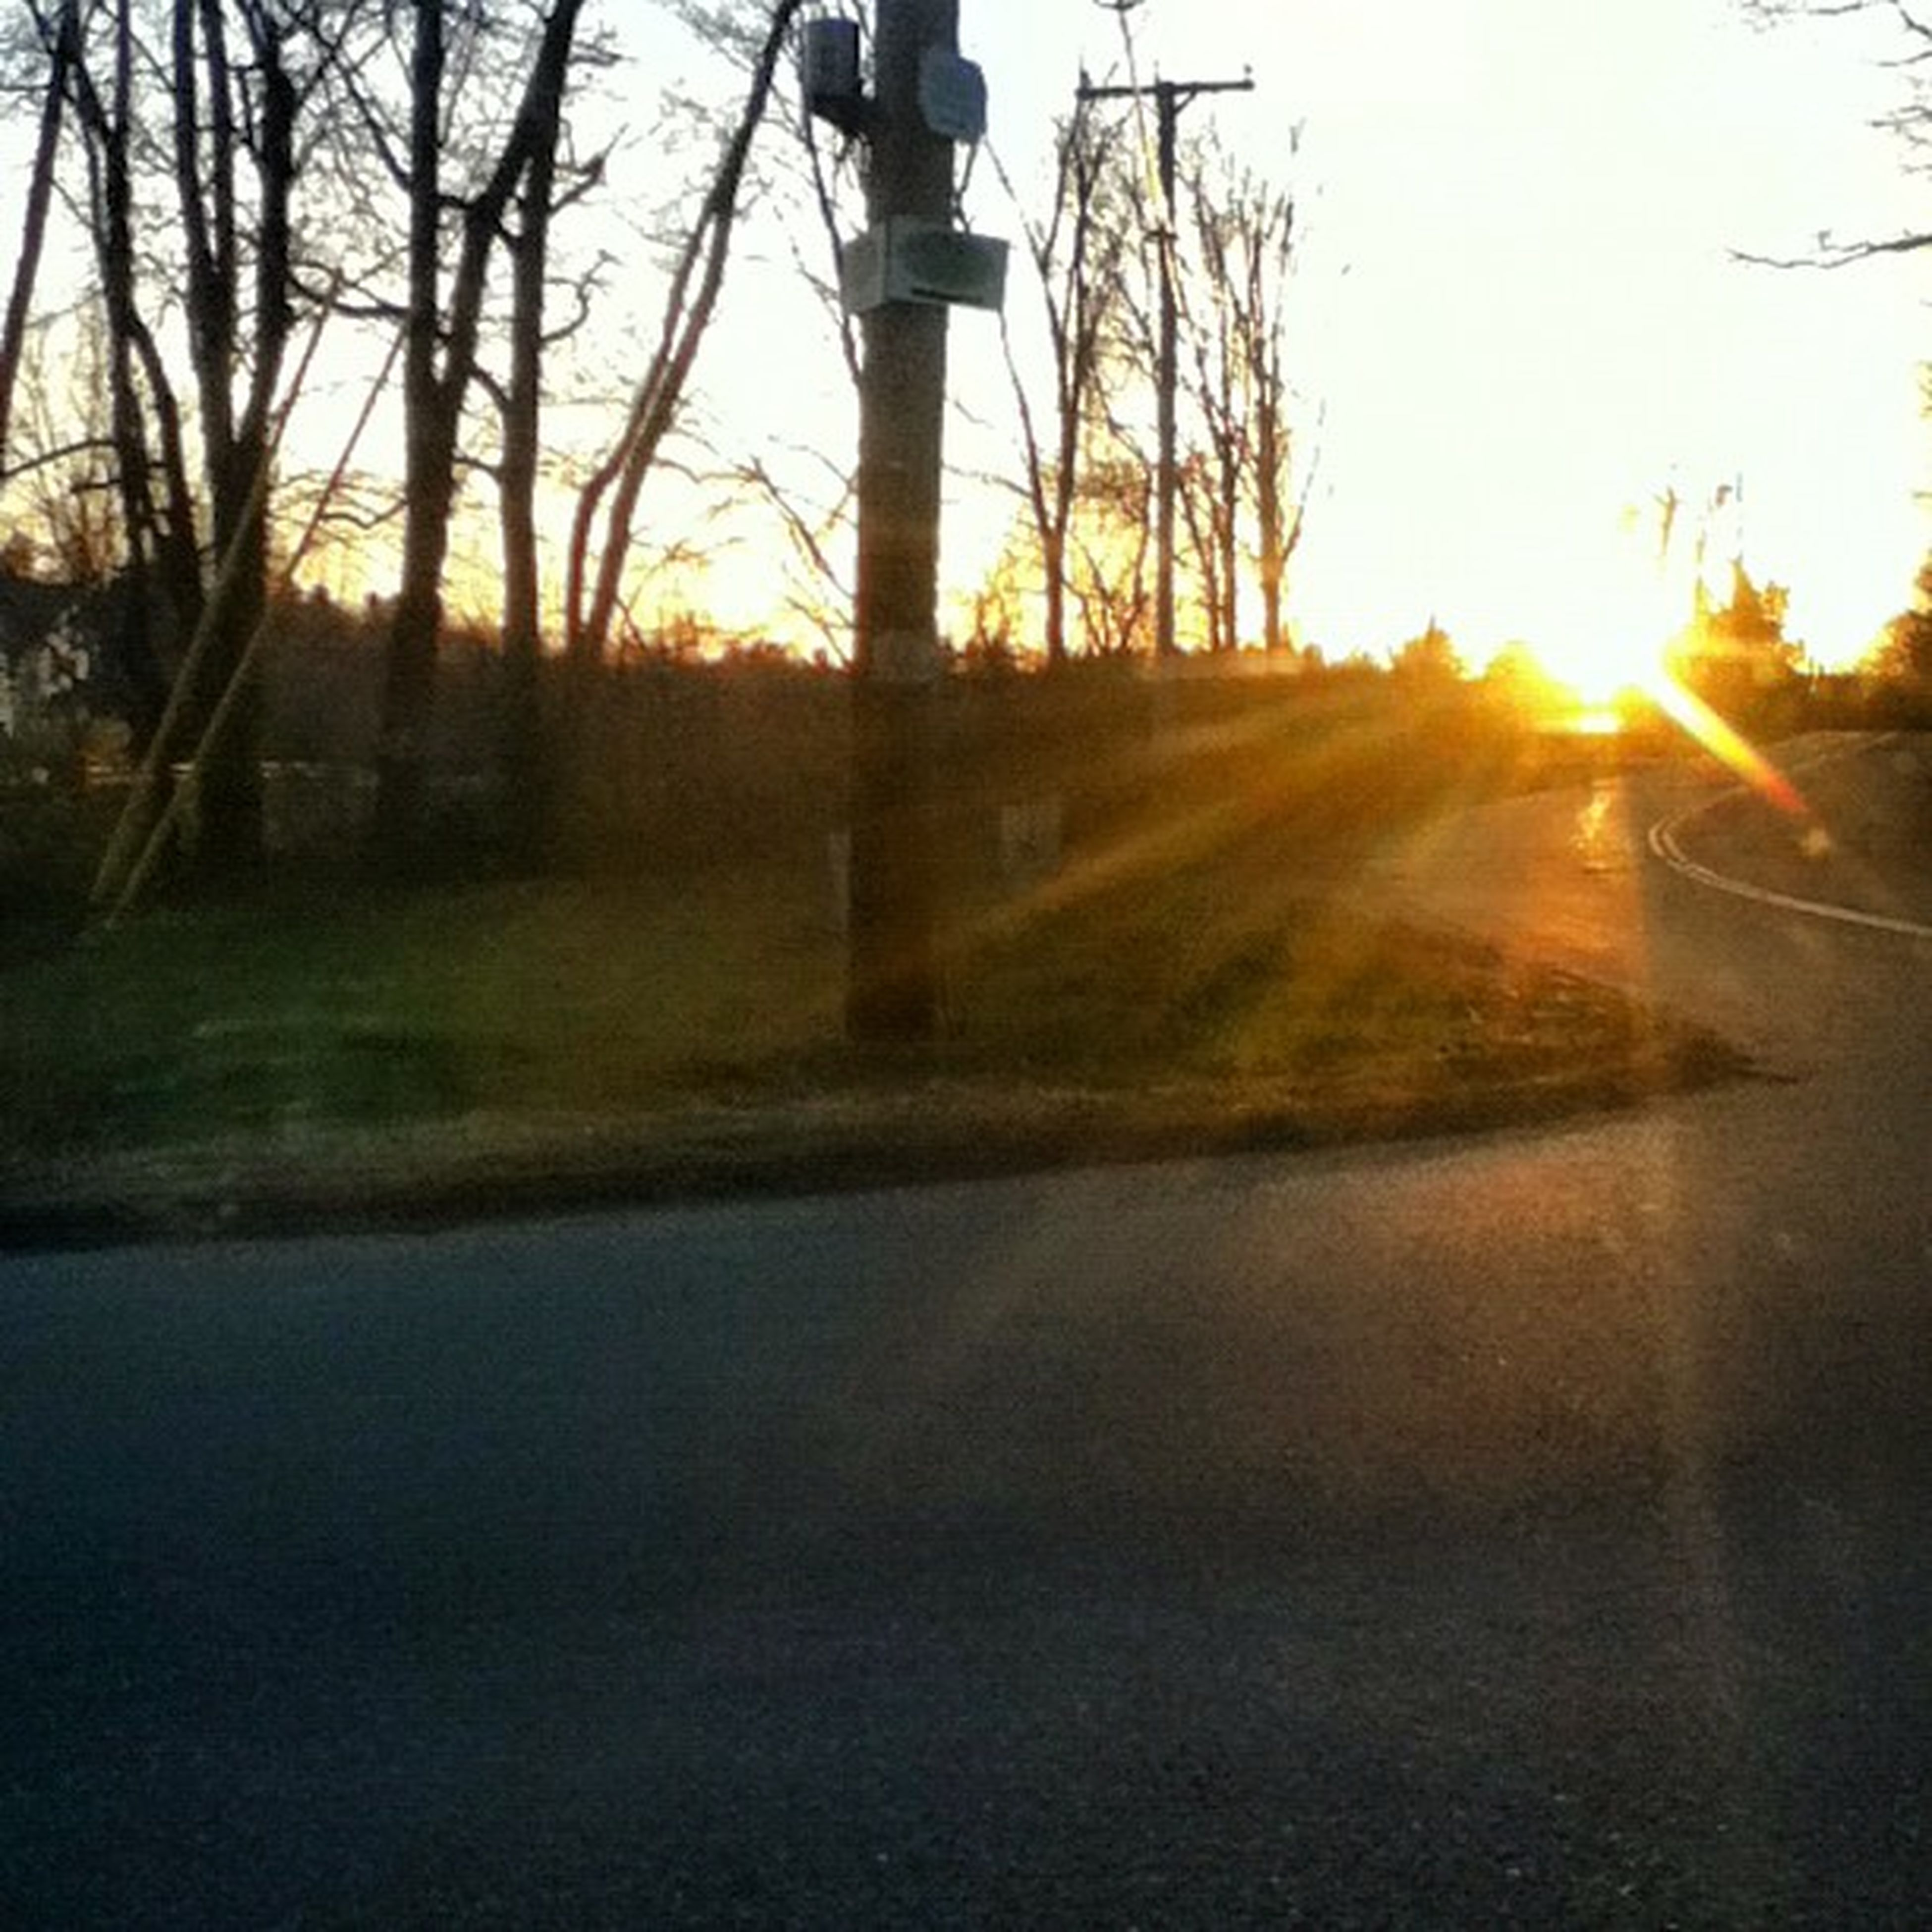 sun, sunset, sunbeam, sunlight, lens flare, tree, silhouette, transportation, orange color, sky, road, back lit, clear sky, car, tranquility, street, nature, reflection, bright, tranquil scene